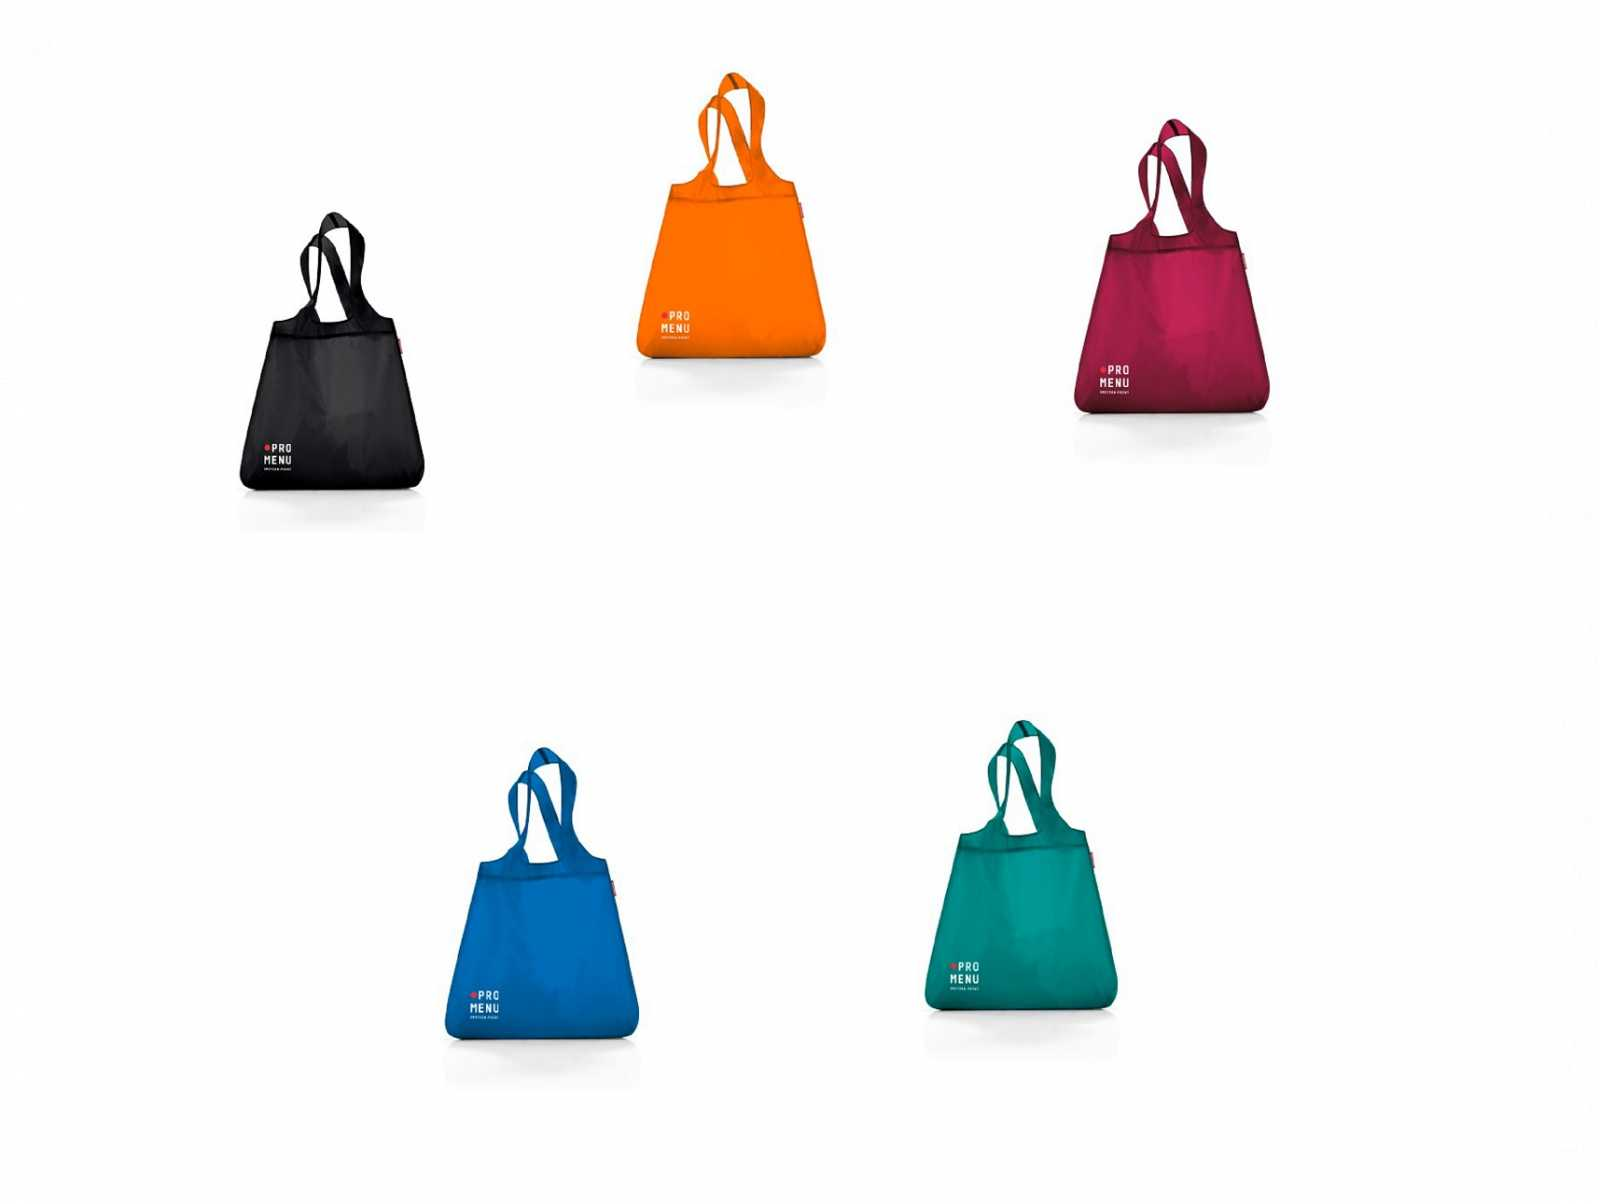 Онлайн каталог PROMENU: Сумка для шоппинга с лого Promenu Reisenthel Mini maxi shopper collection, 43,5 х 63 х 6 cм, цвет в ассортименте Reisenthel AT 0002LOGO